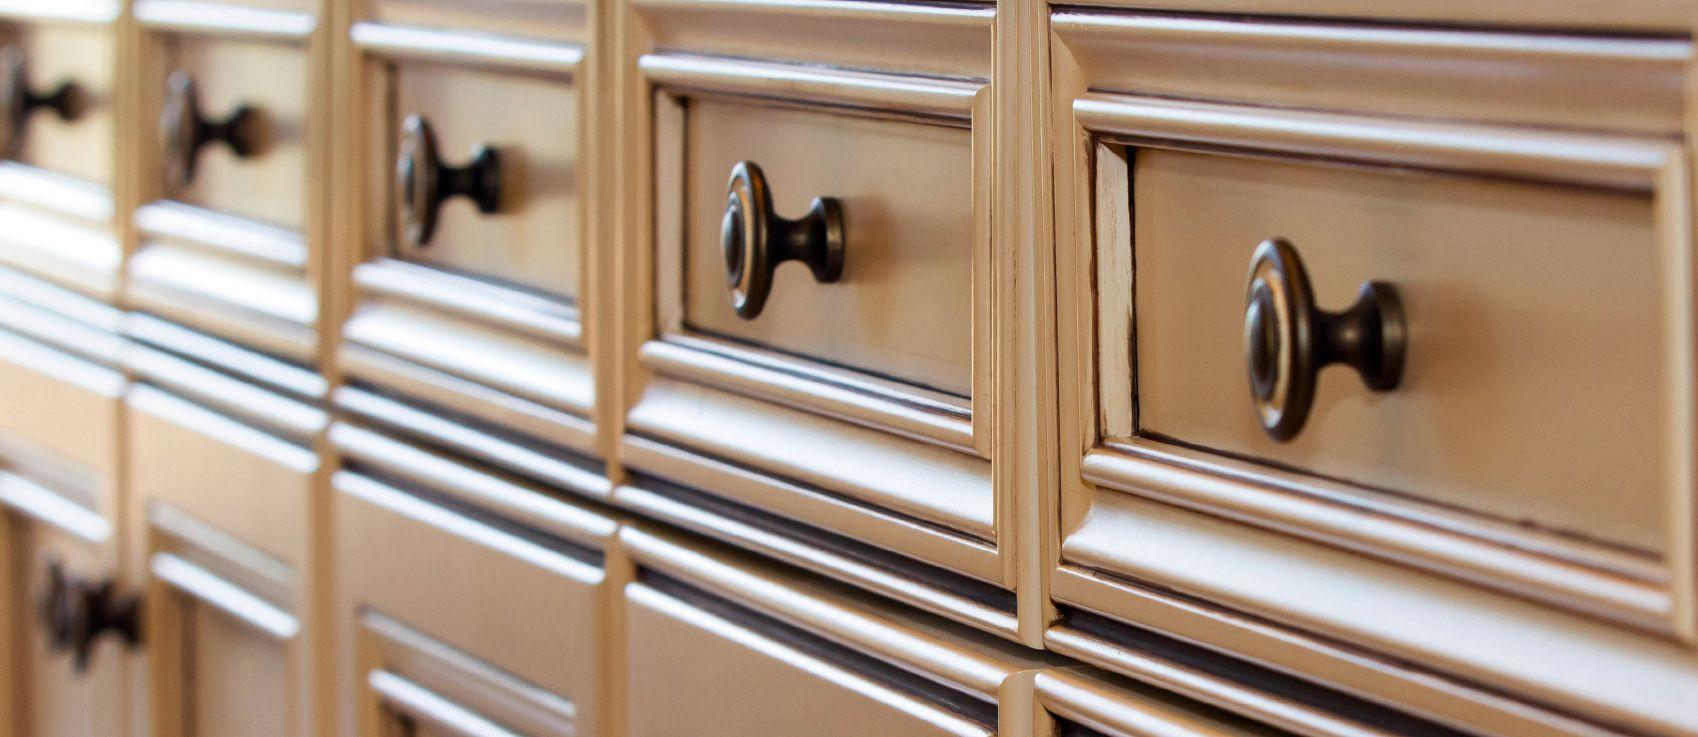 door knobs for kitchen cabinets photo - 17